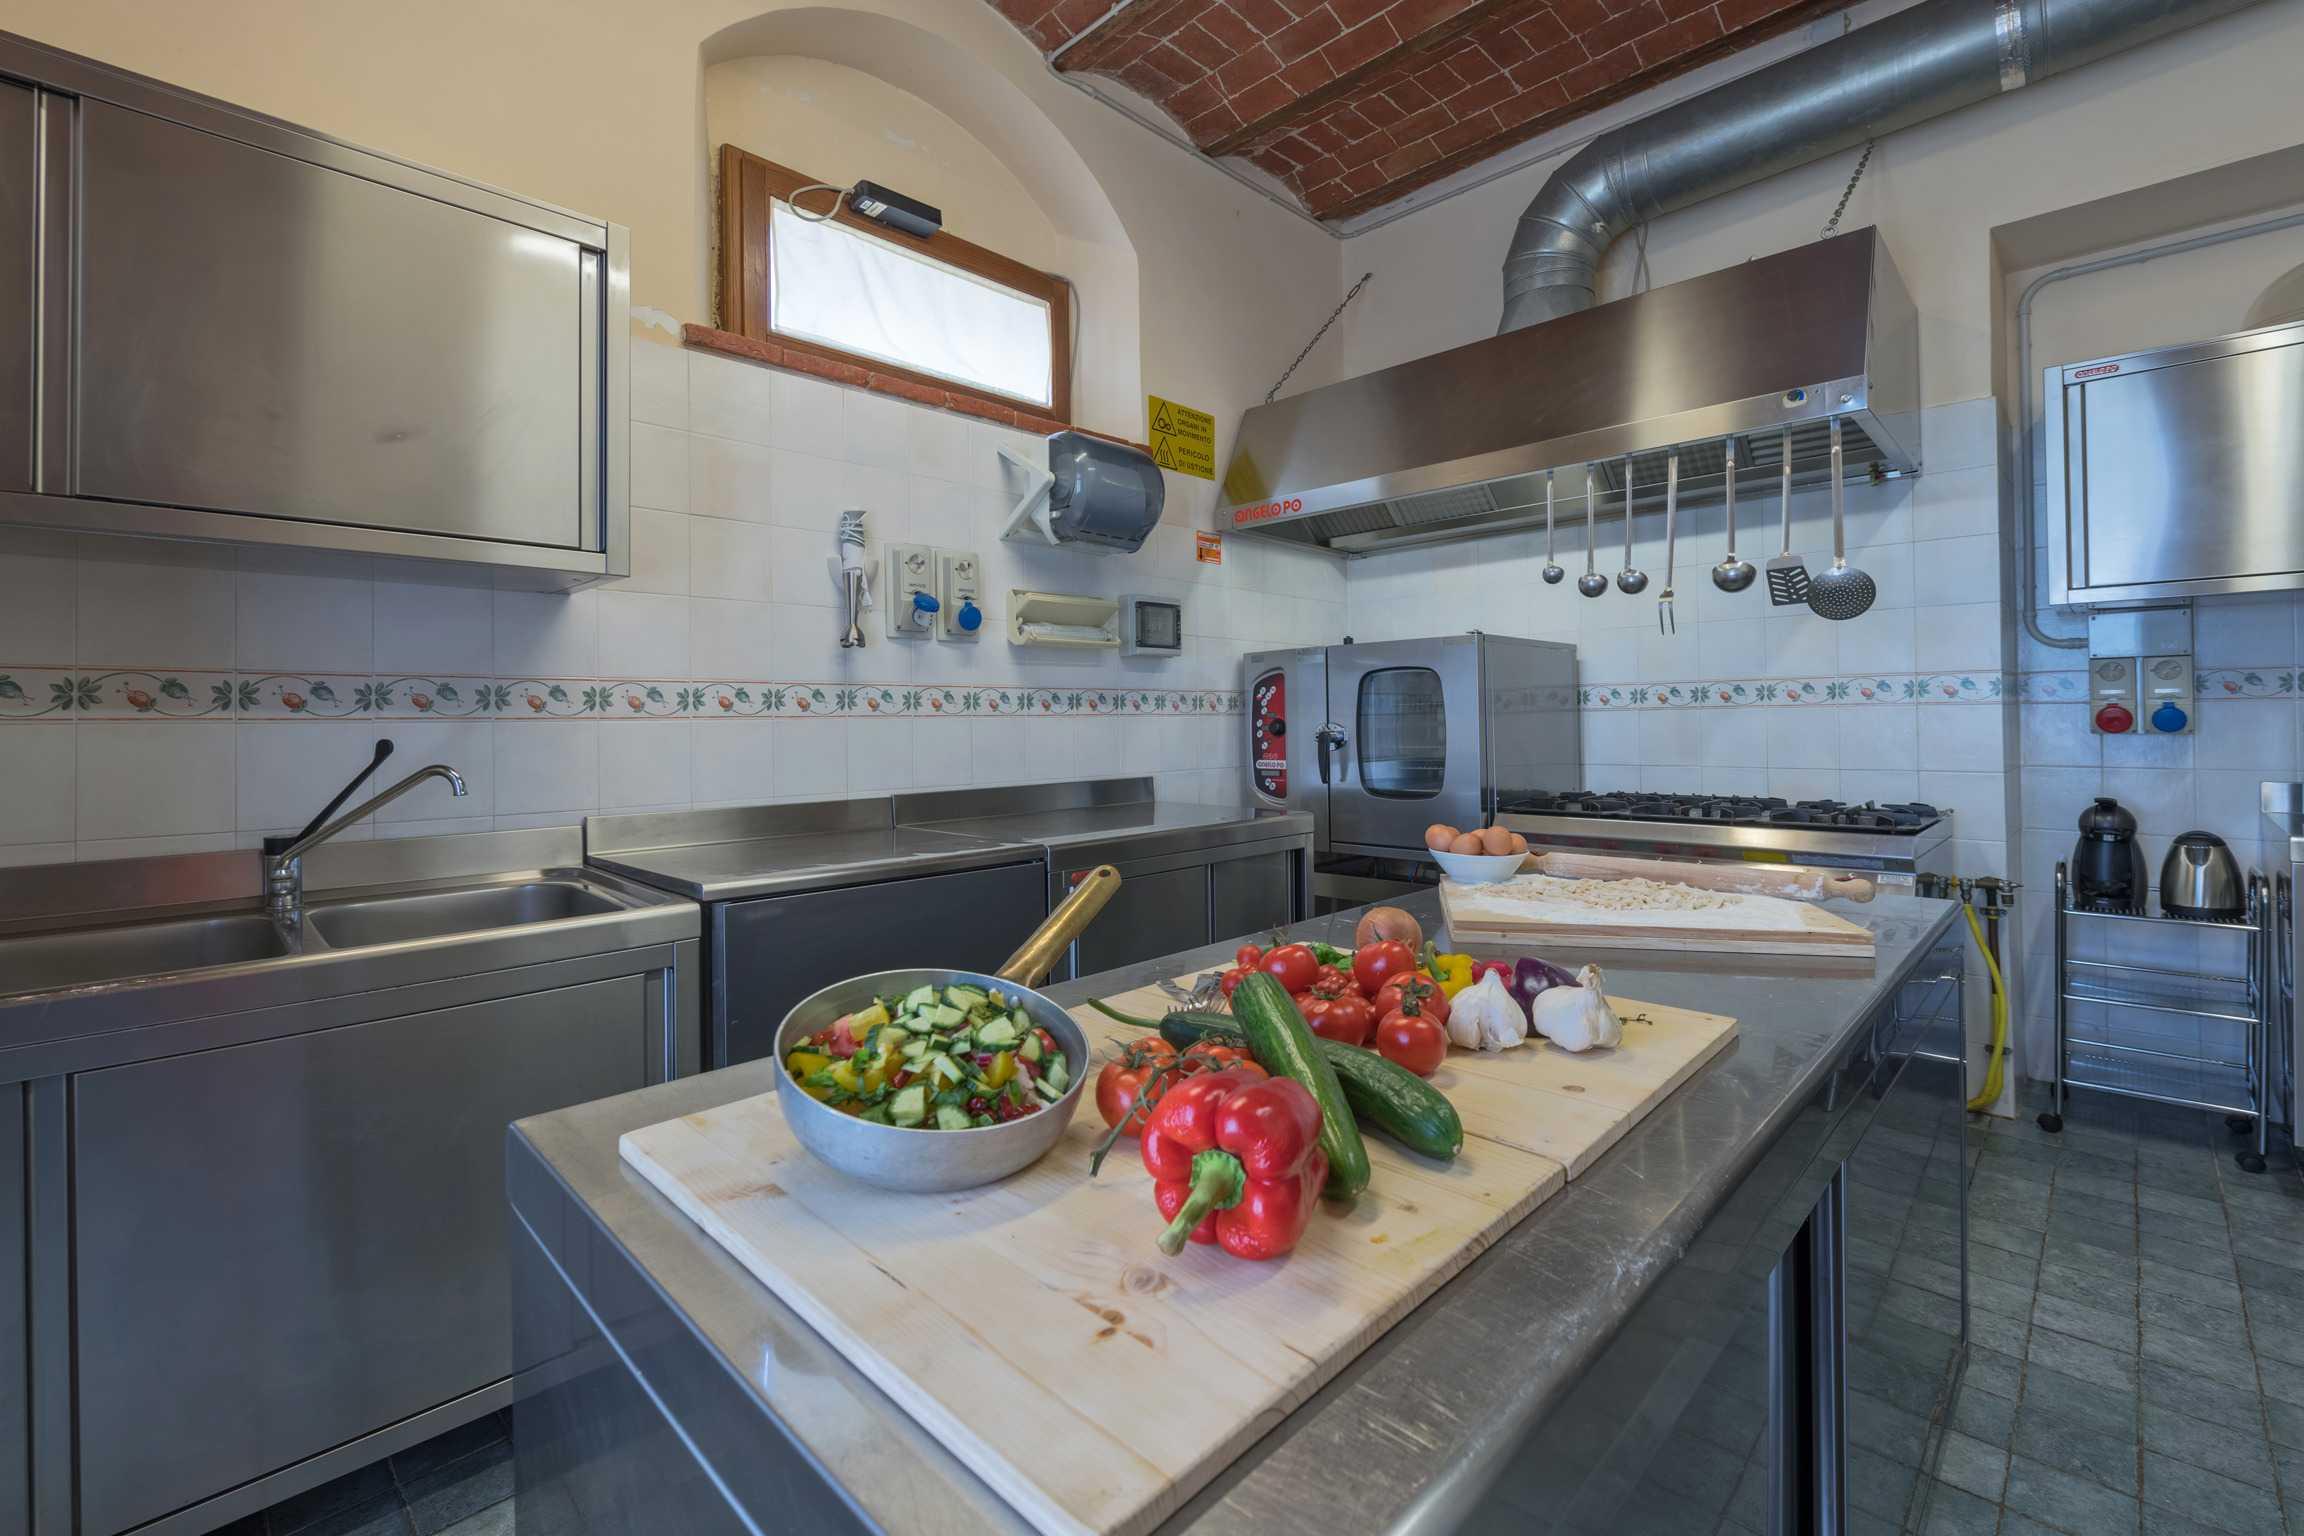 Villa de' Michelangioli keuken